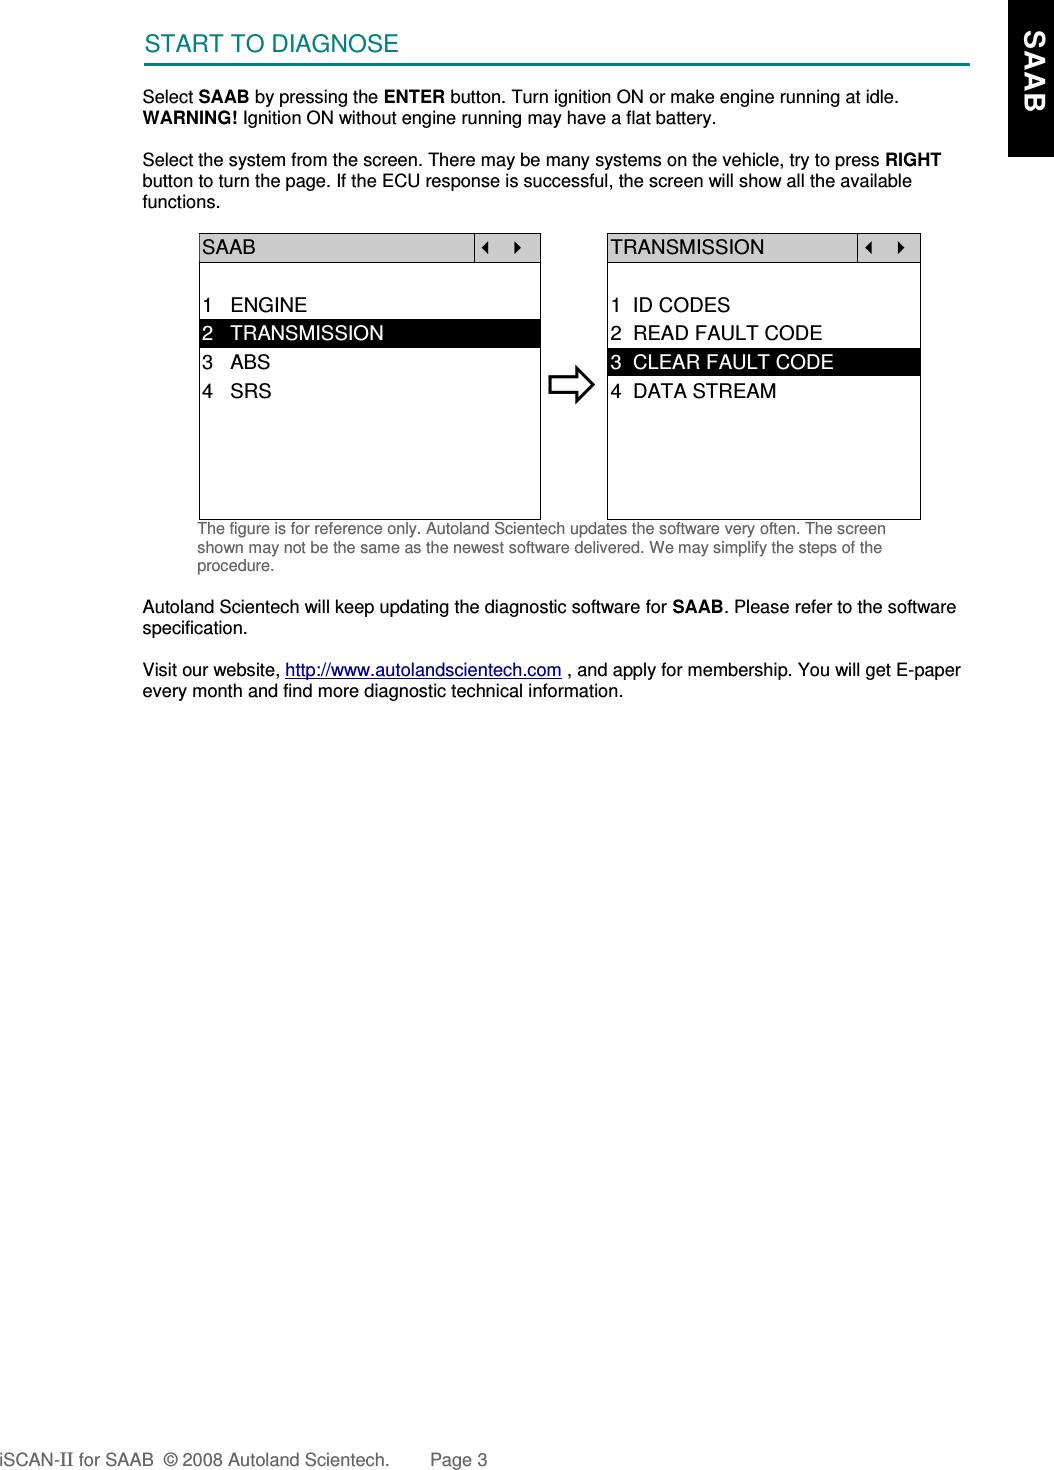 AUTOLAND SCIENTECH ISCANII-BU Car Diagnostician User Manual